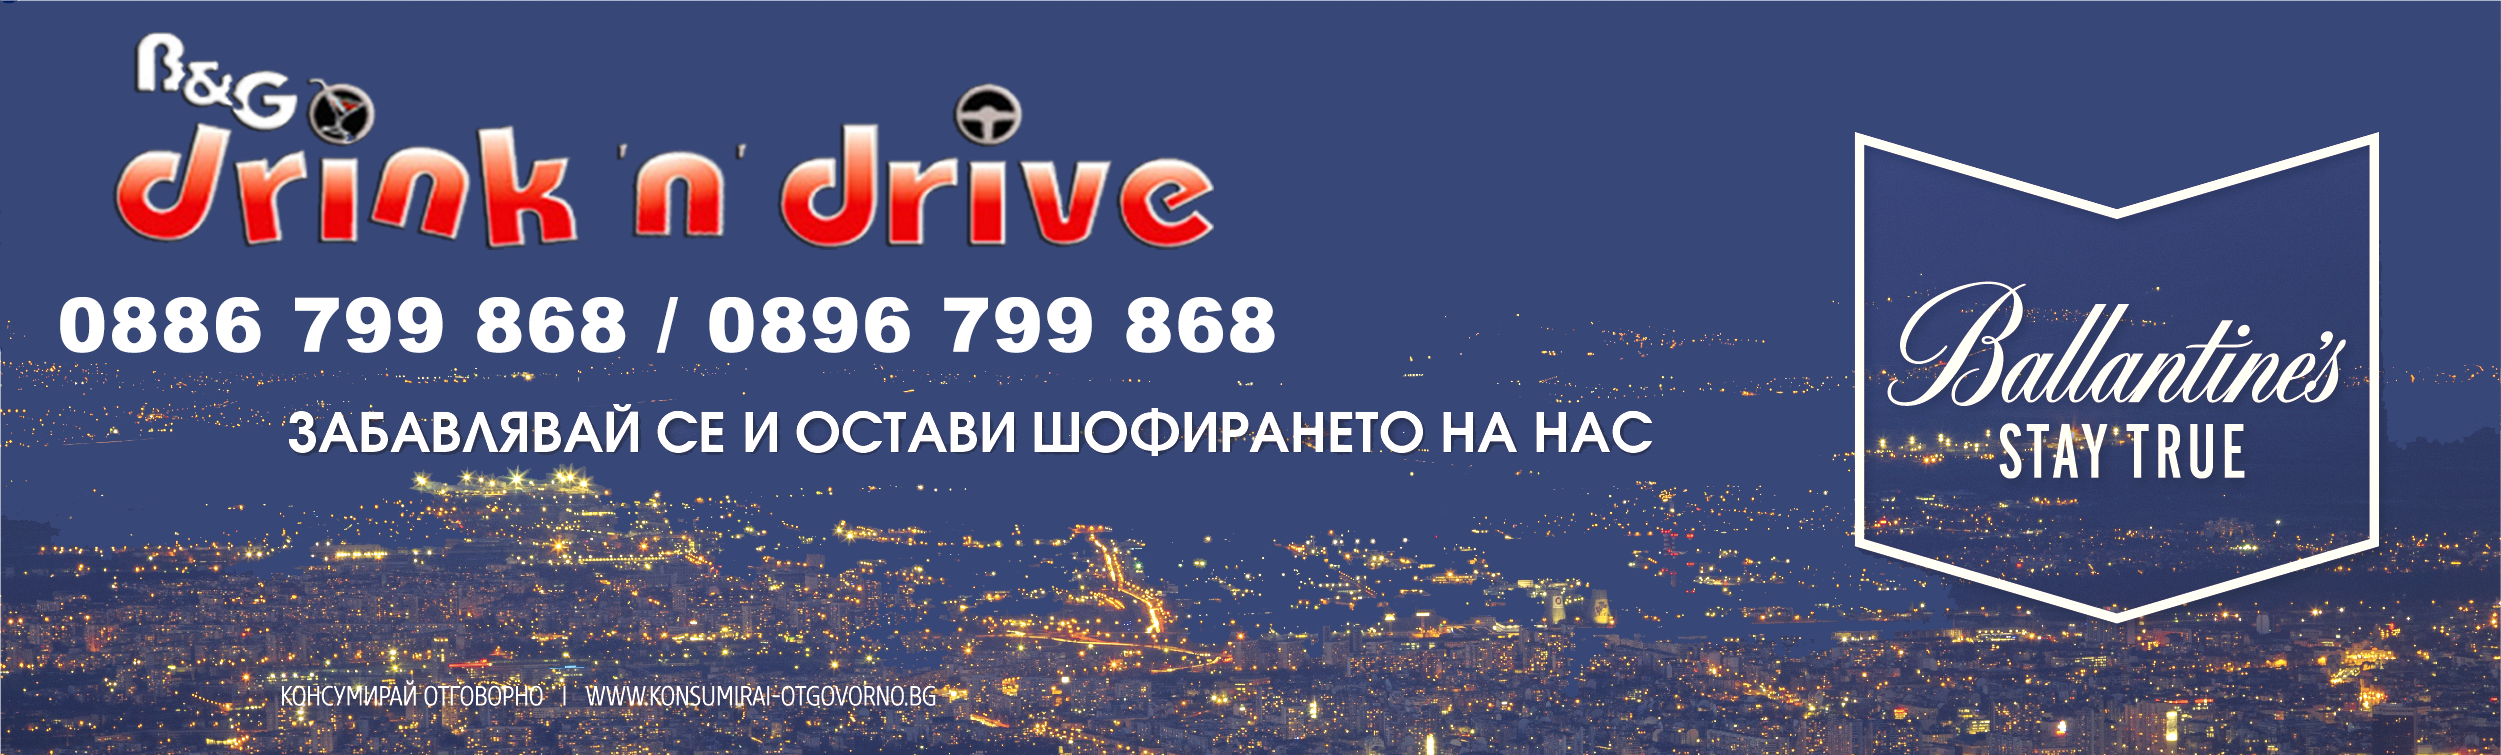 Drink and drive Sofia